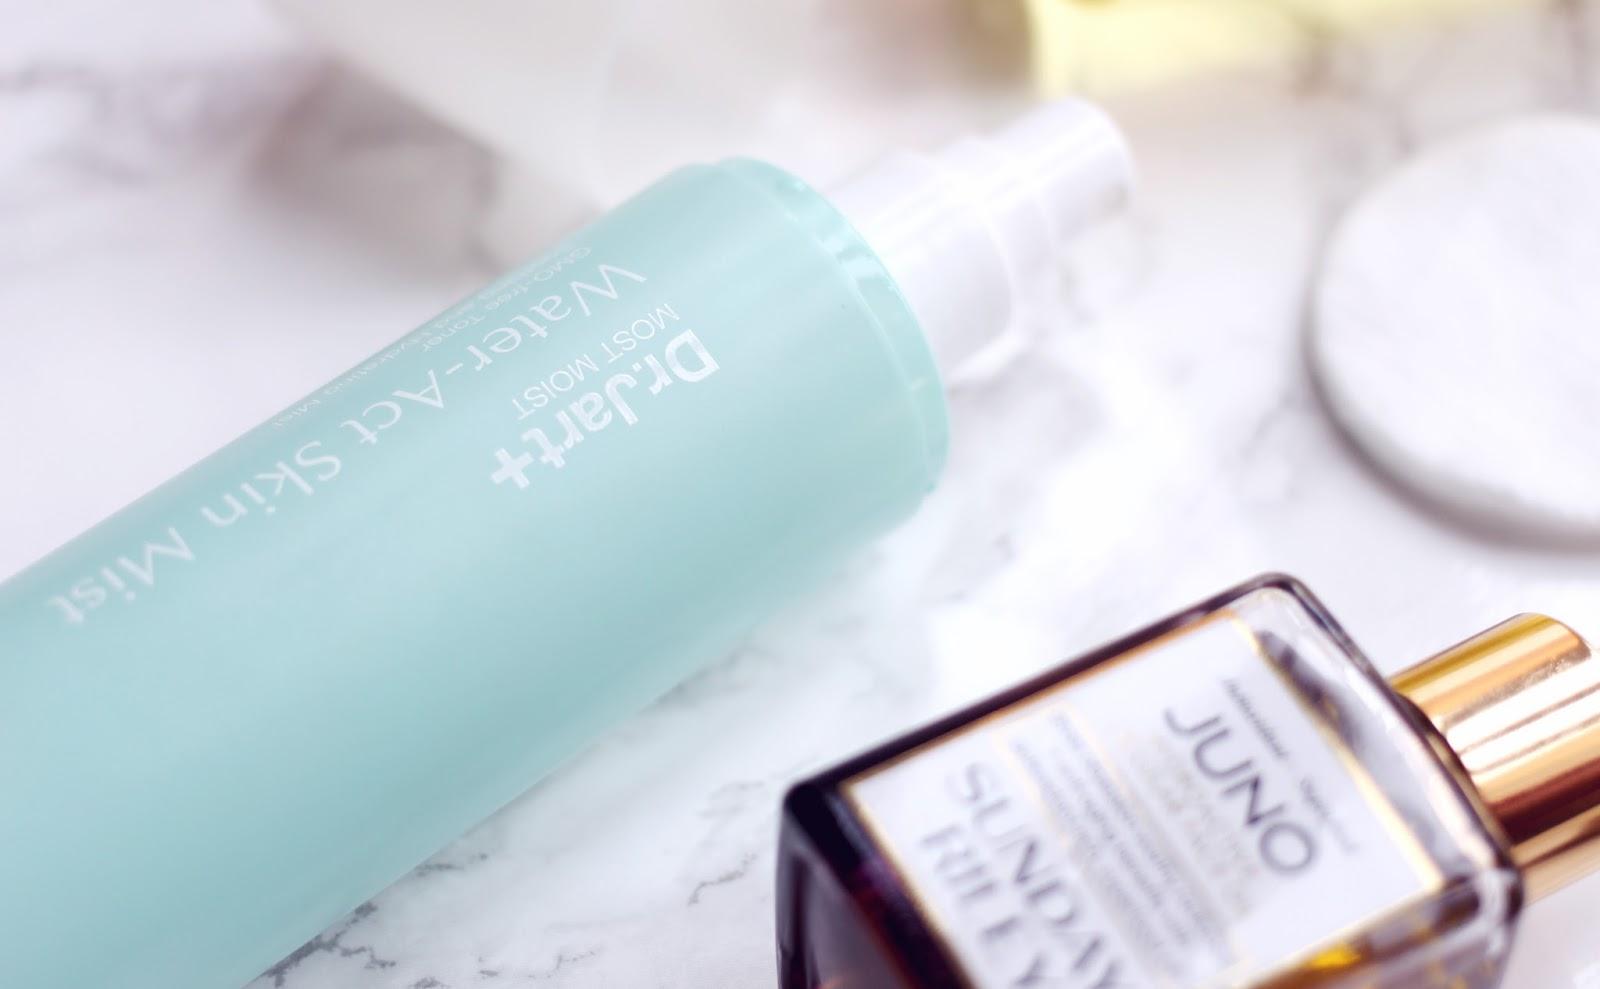 Dr Jart Water-Act Skin Mist